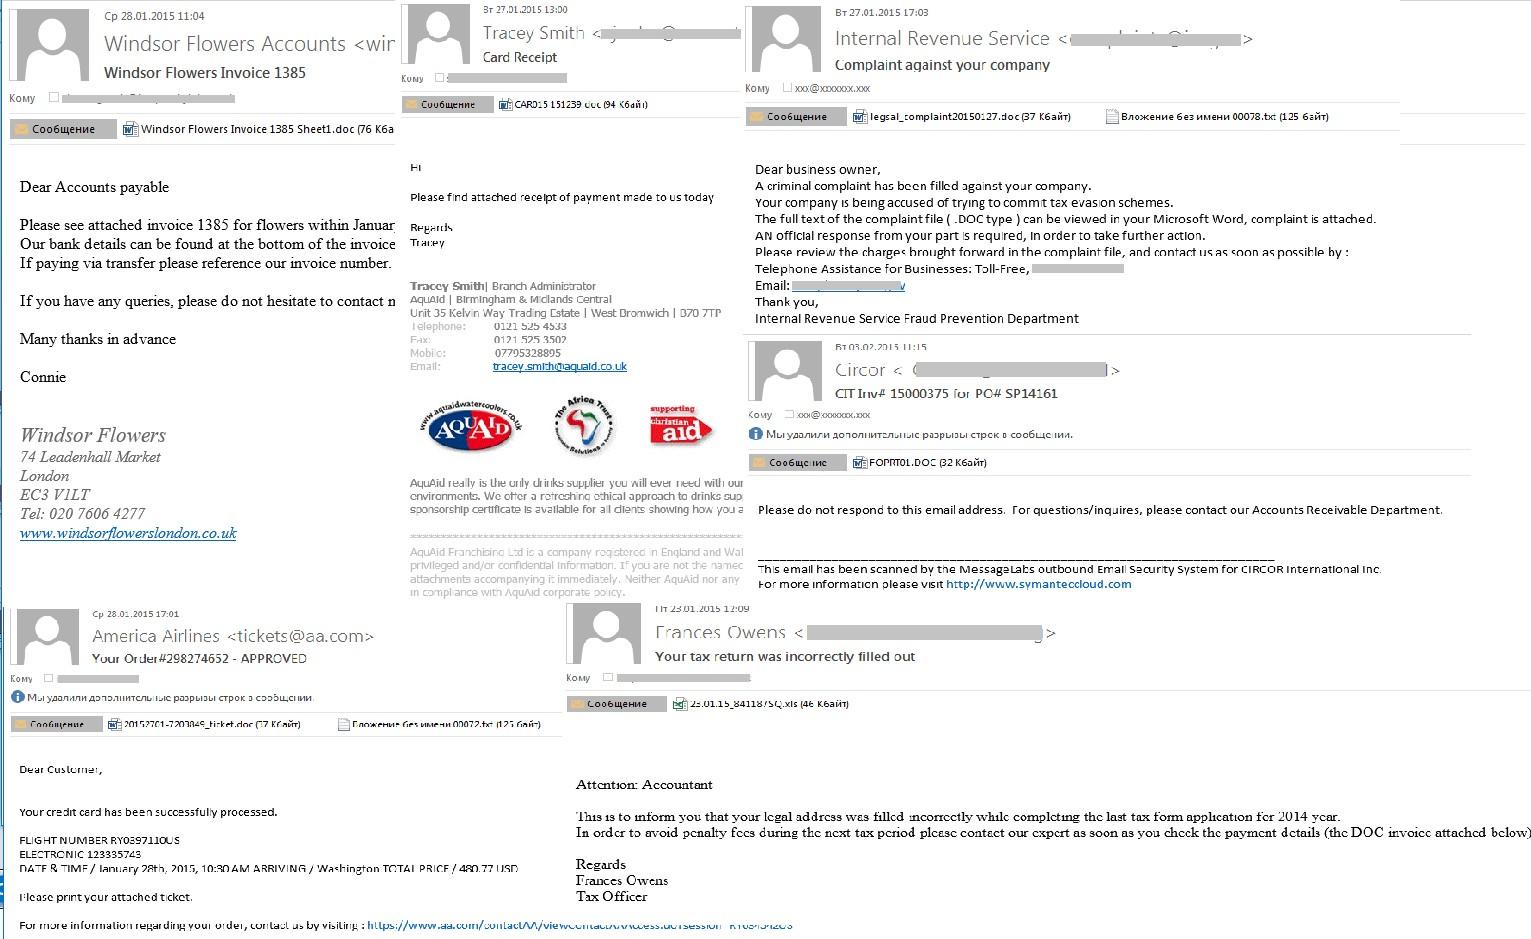 Spam-report_Q1-2015_8